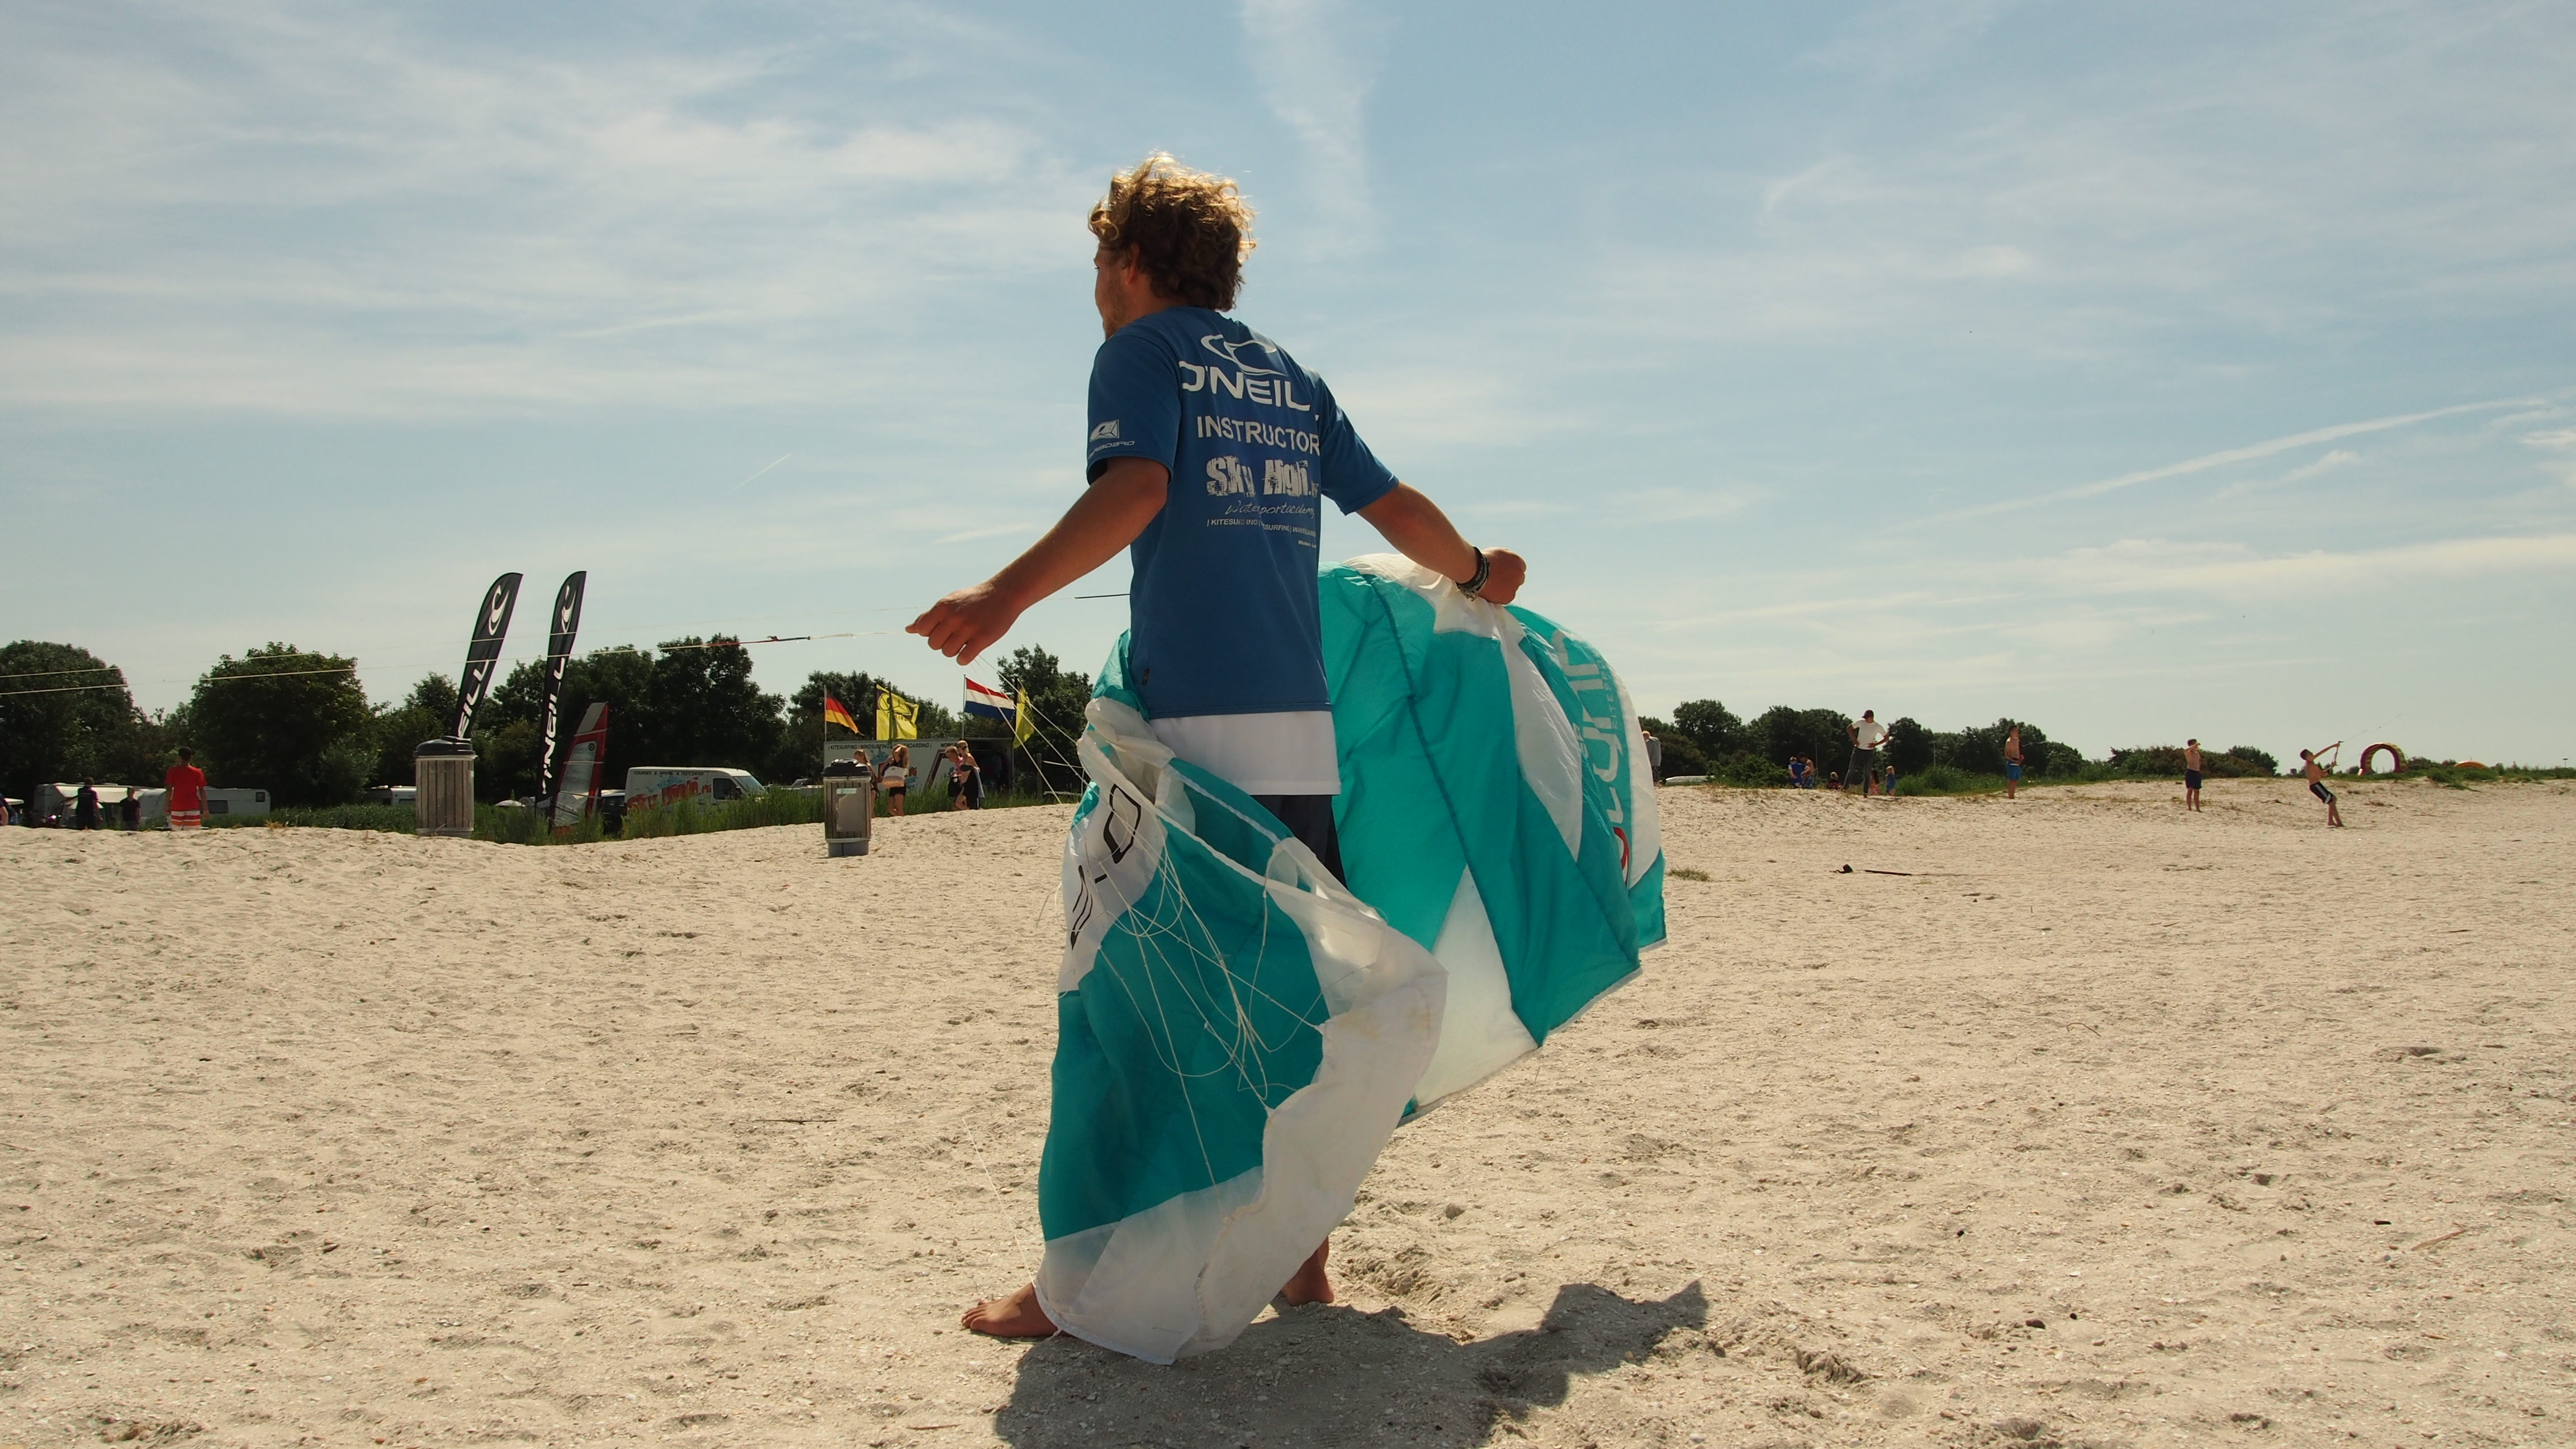 kitesurfen workum skyhigh